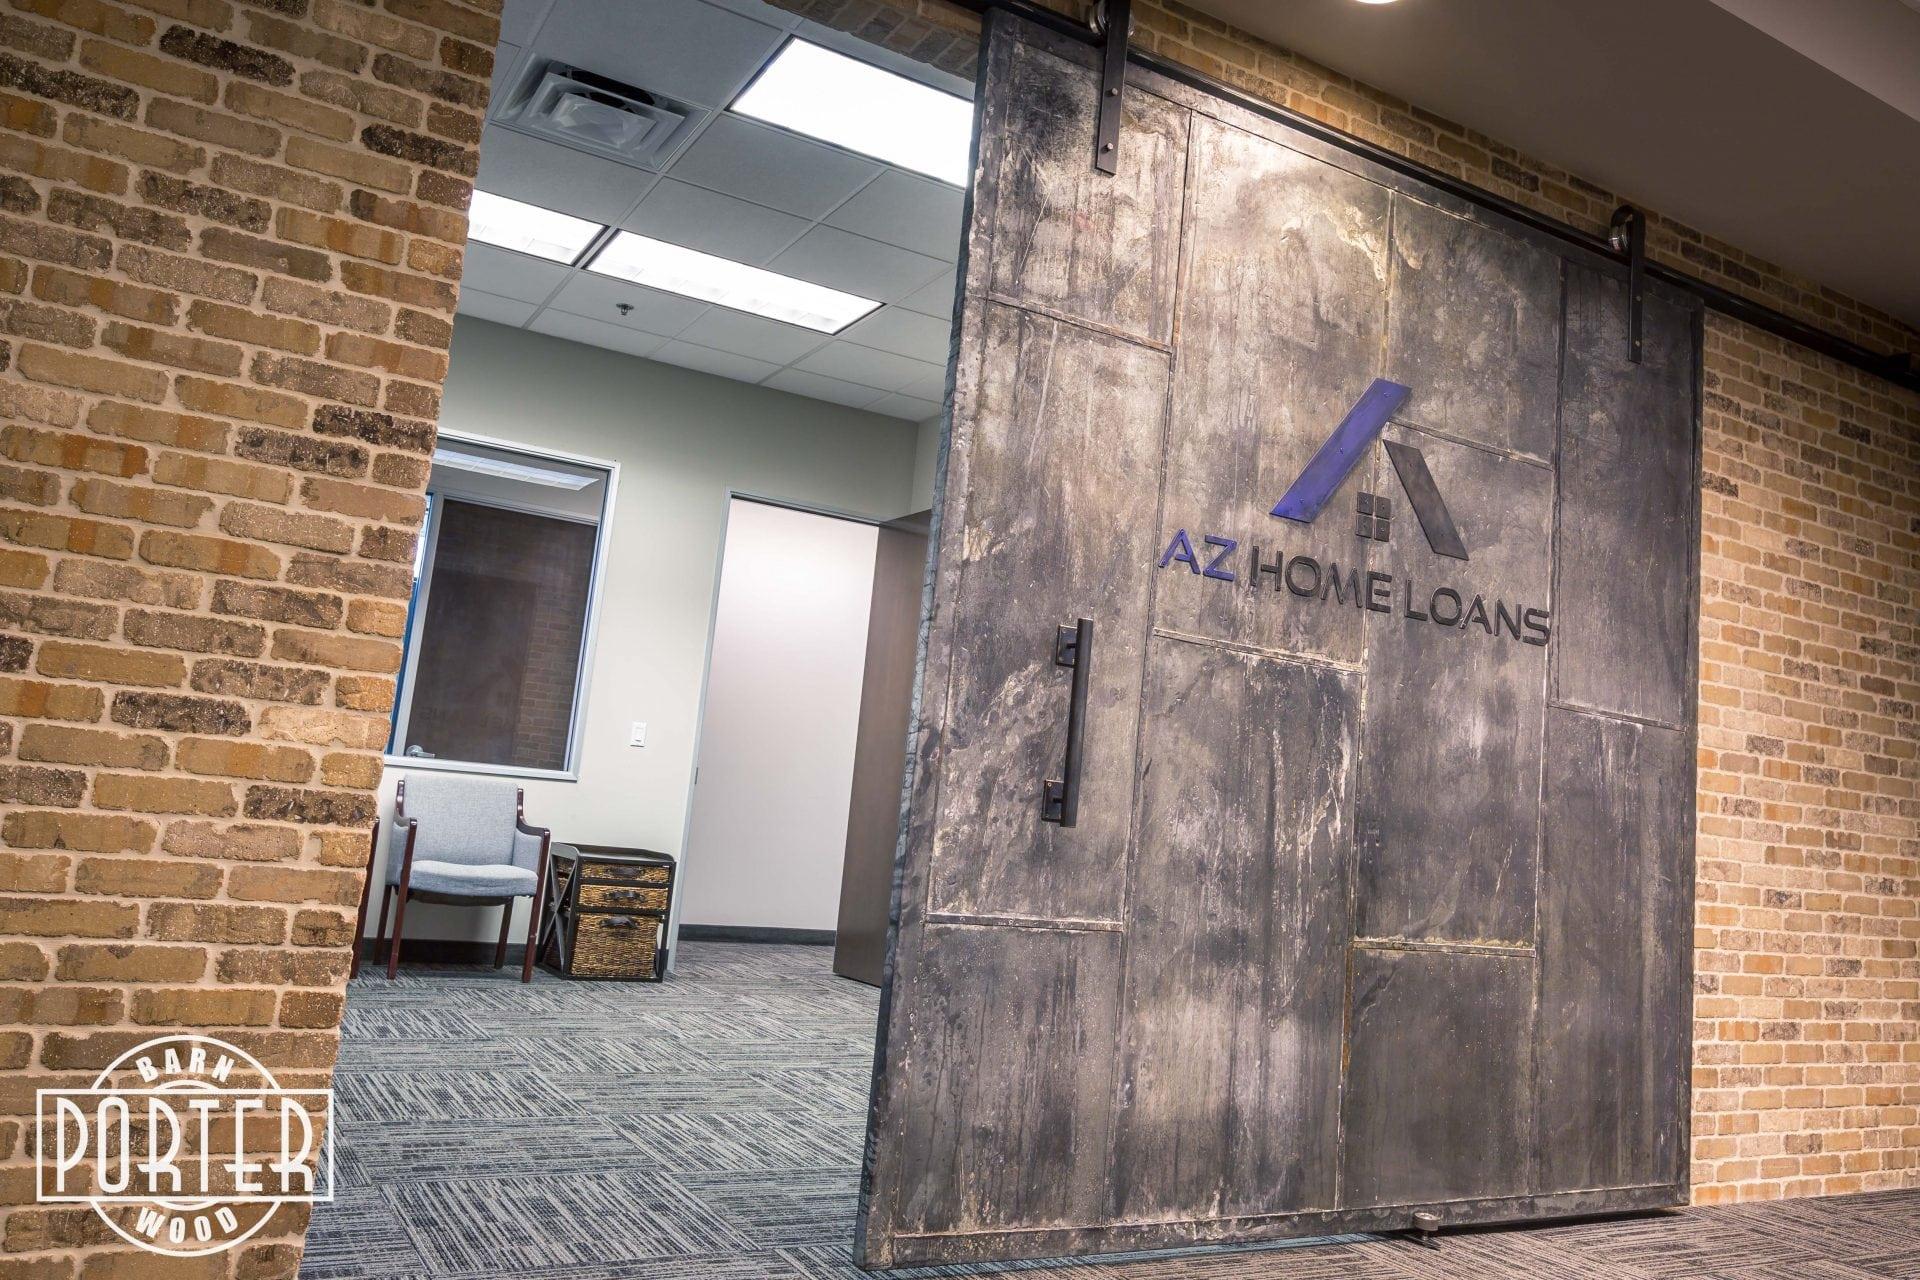 AzHomeLoans-1 & Az Home Loans Fire Door | Porter Barn Wood